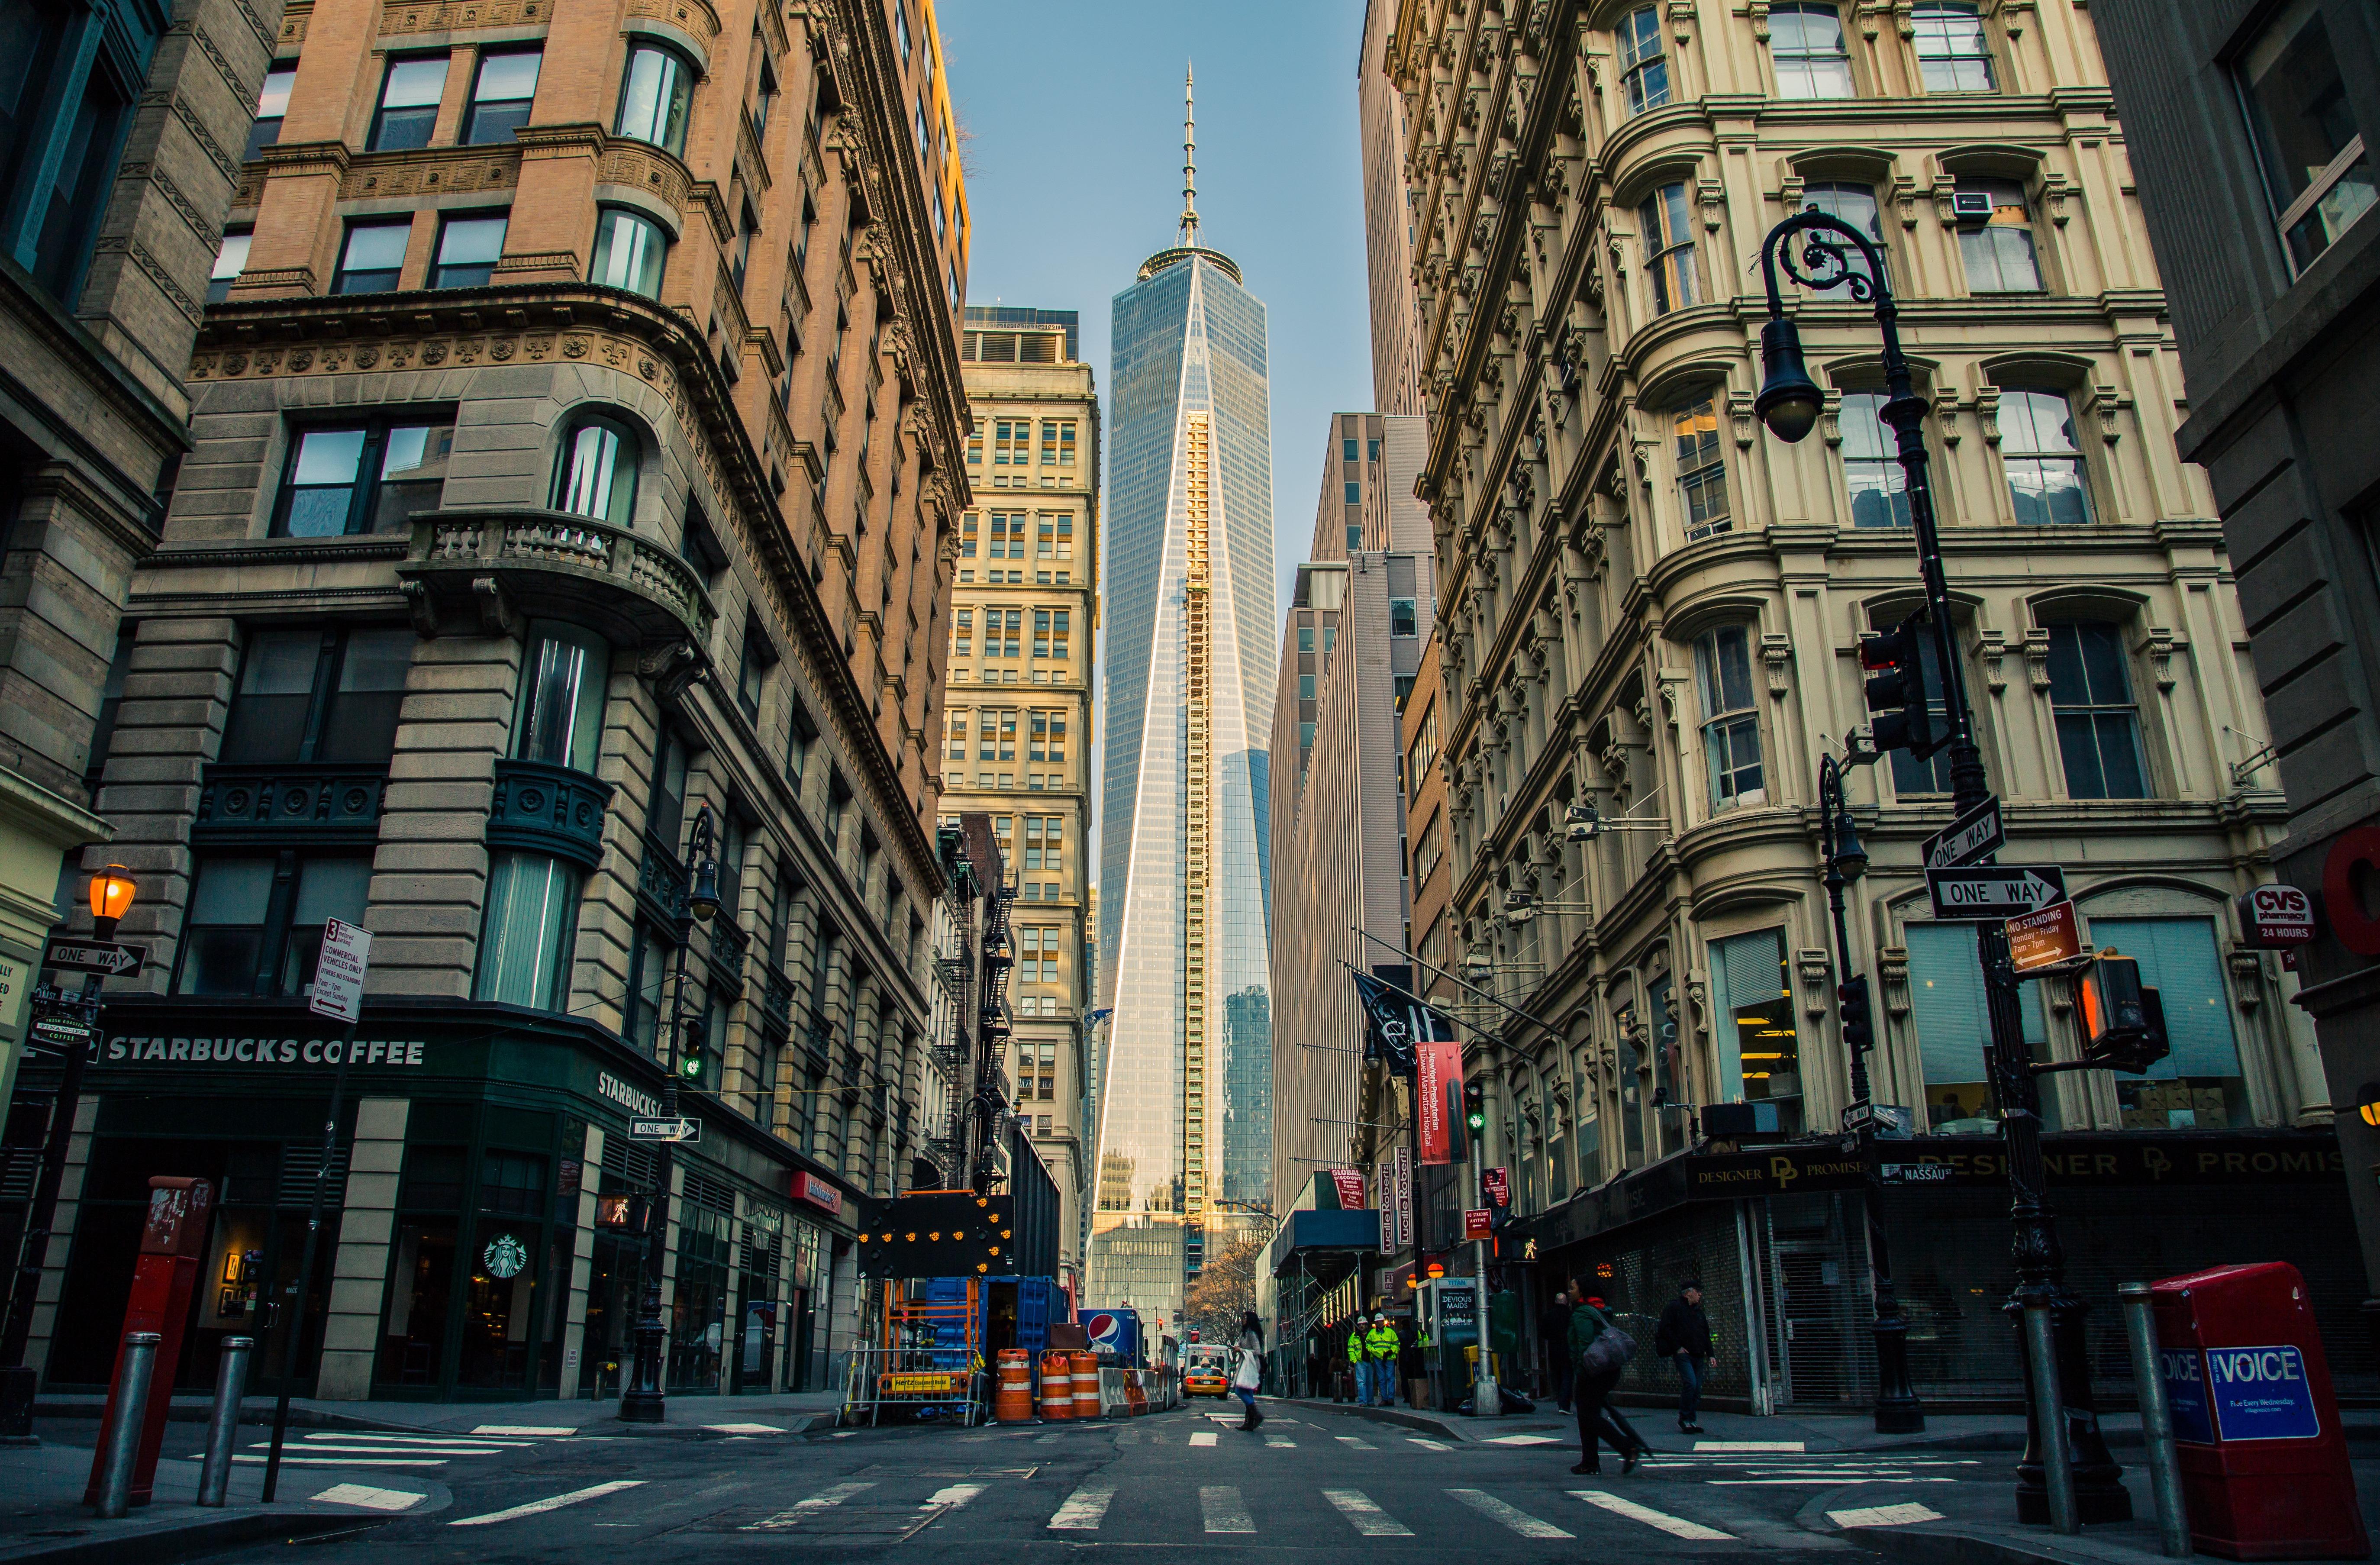 pedestrian-architecture-people-road-street-sidewalk-971390-pxhere.com.jpg